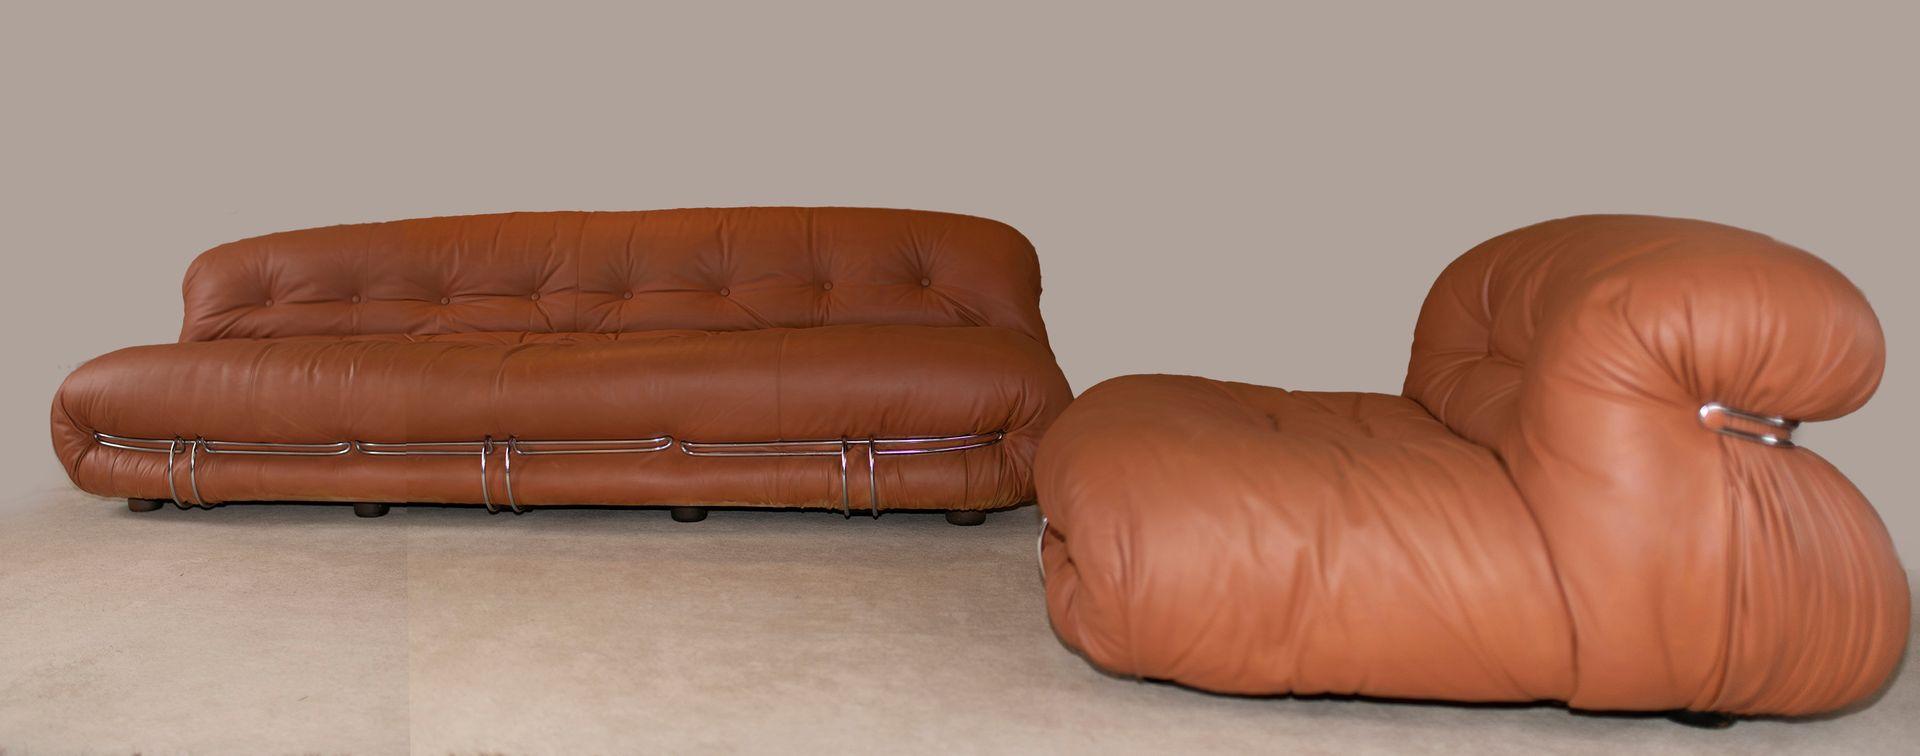 Full Size of Soriana Sofa Easy Chair By Tobia Afra Scarpa For Cassina Günstig Kaufen Lounge Garten Ektorp Modulares Leinen Boxspring Big Sam 3 2 1 Sitzer Xxl U Form Mit Sofa Cassina Sofa